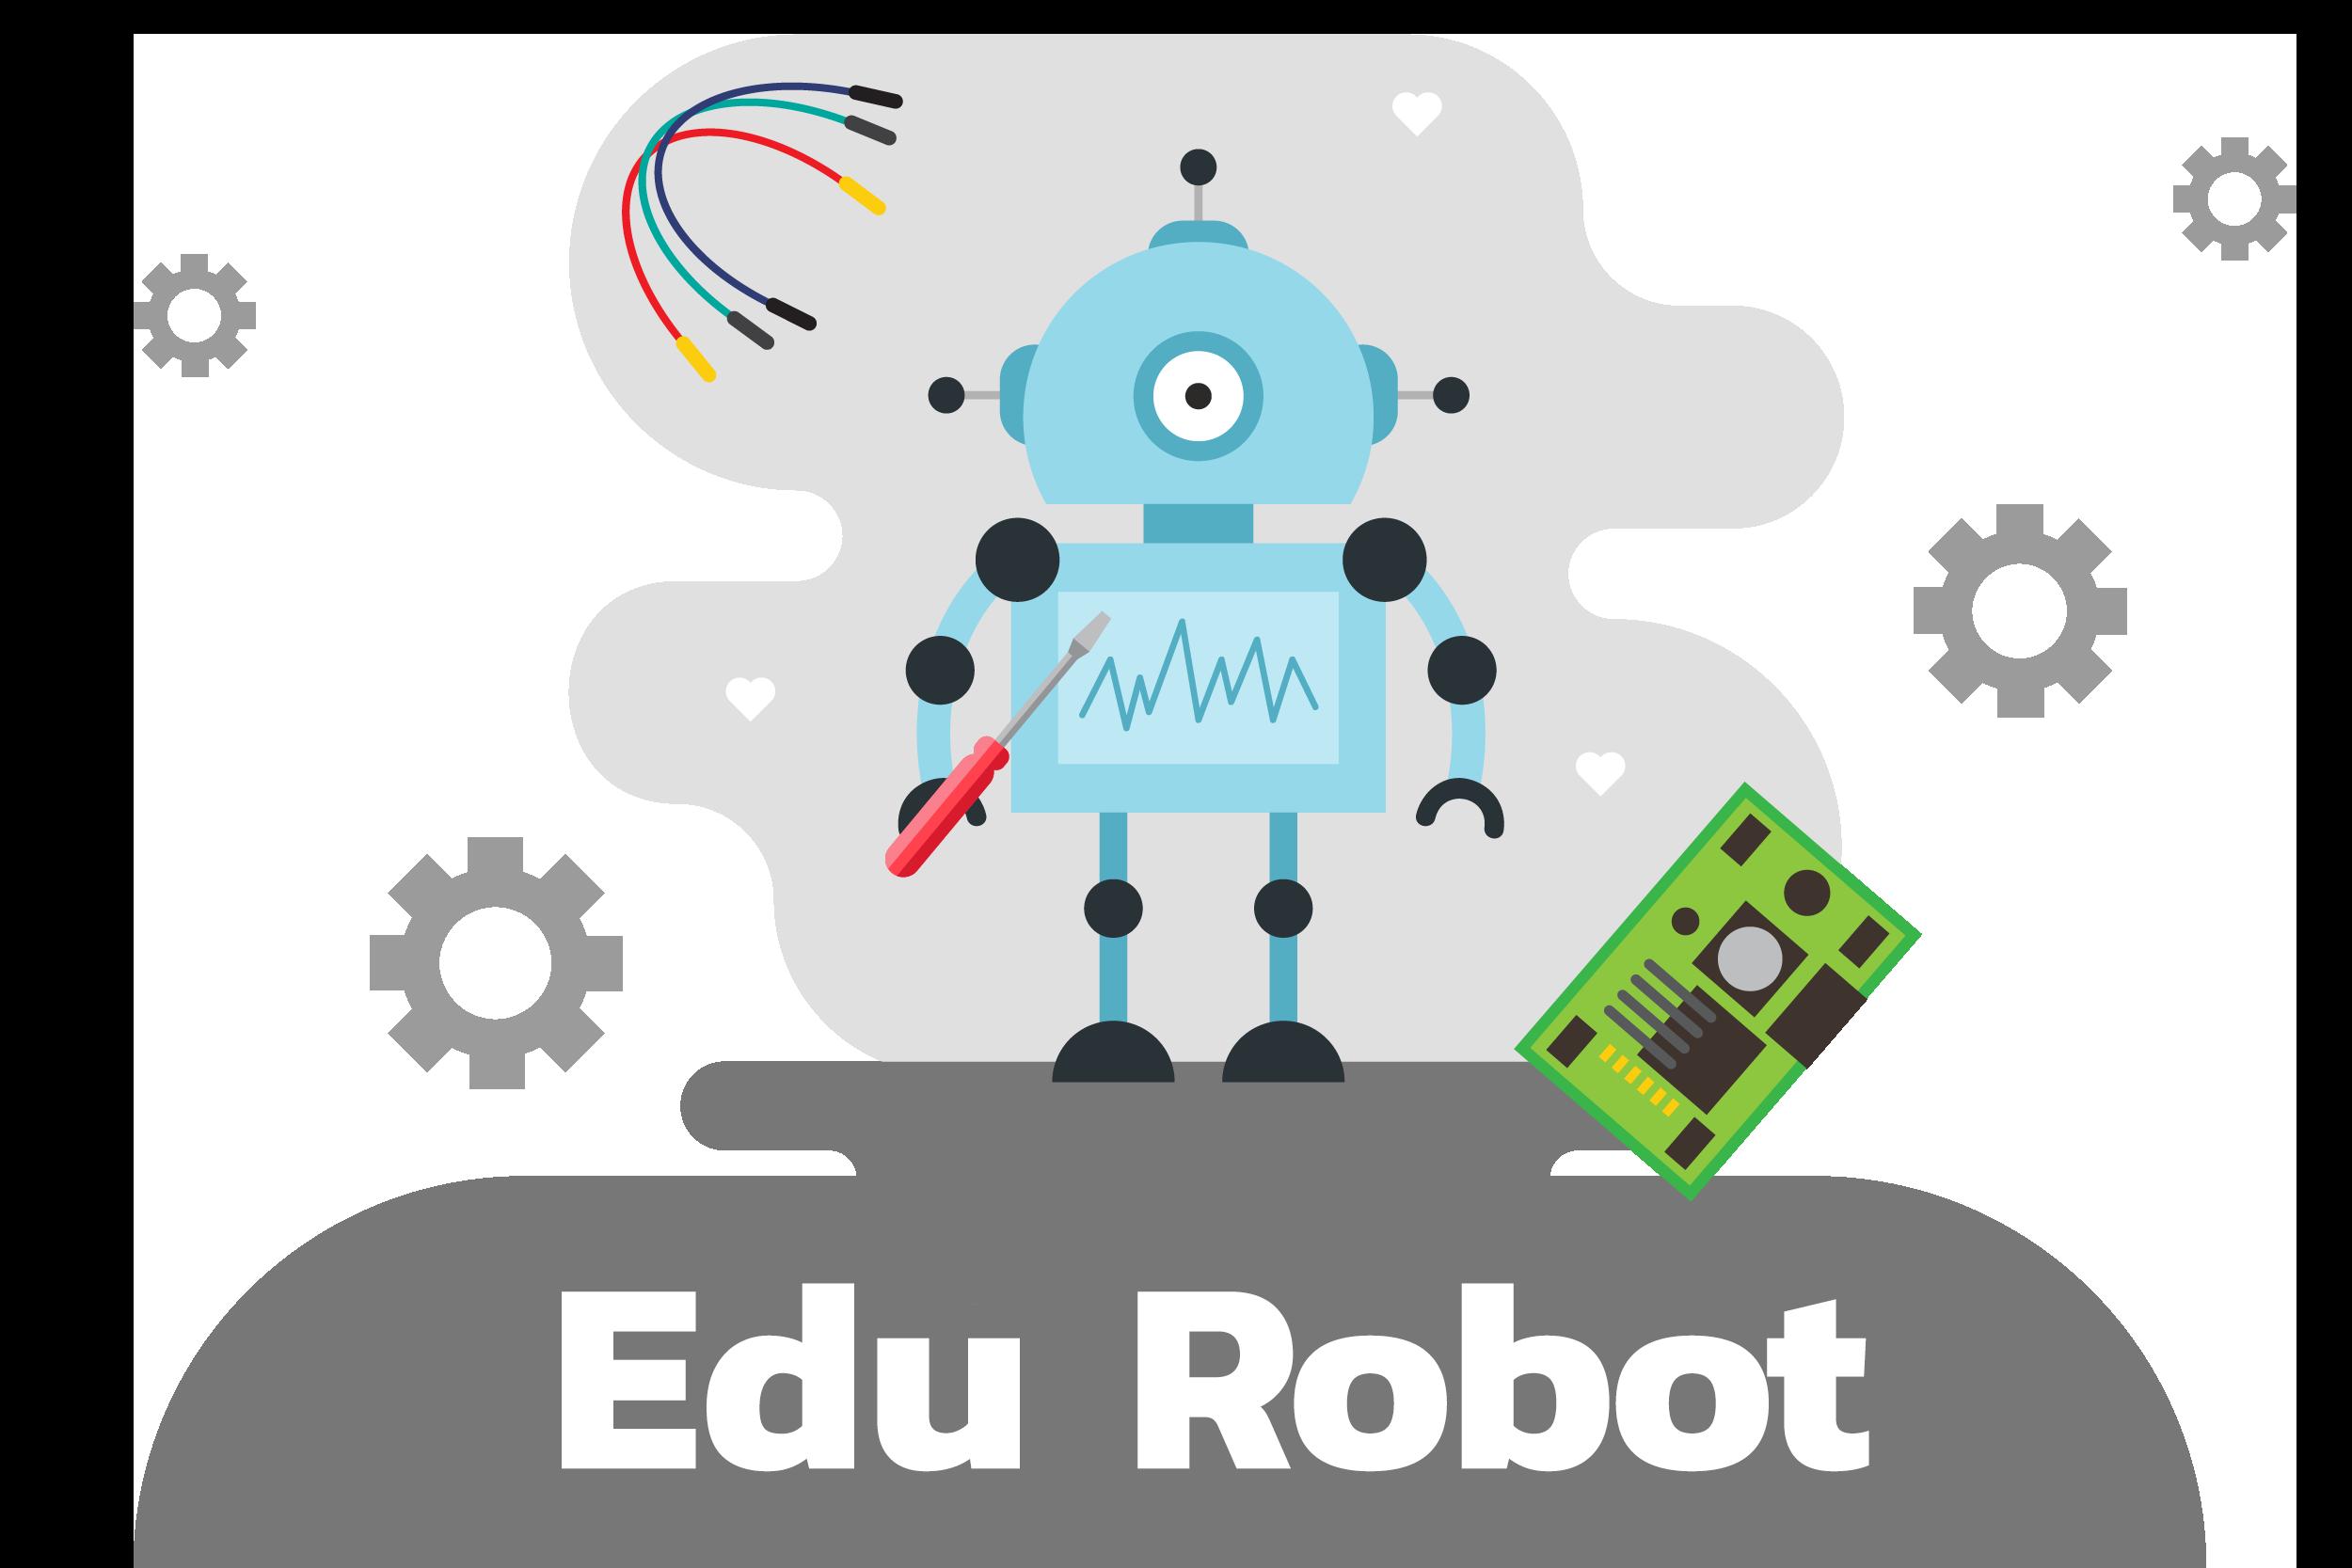 Edu Robot